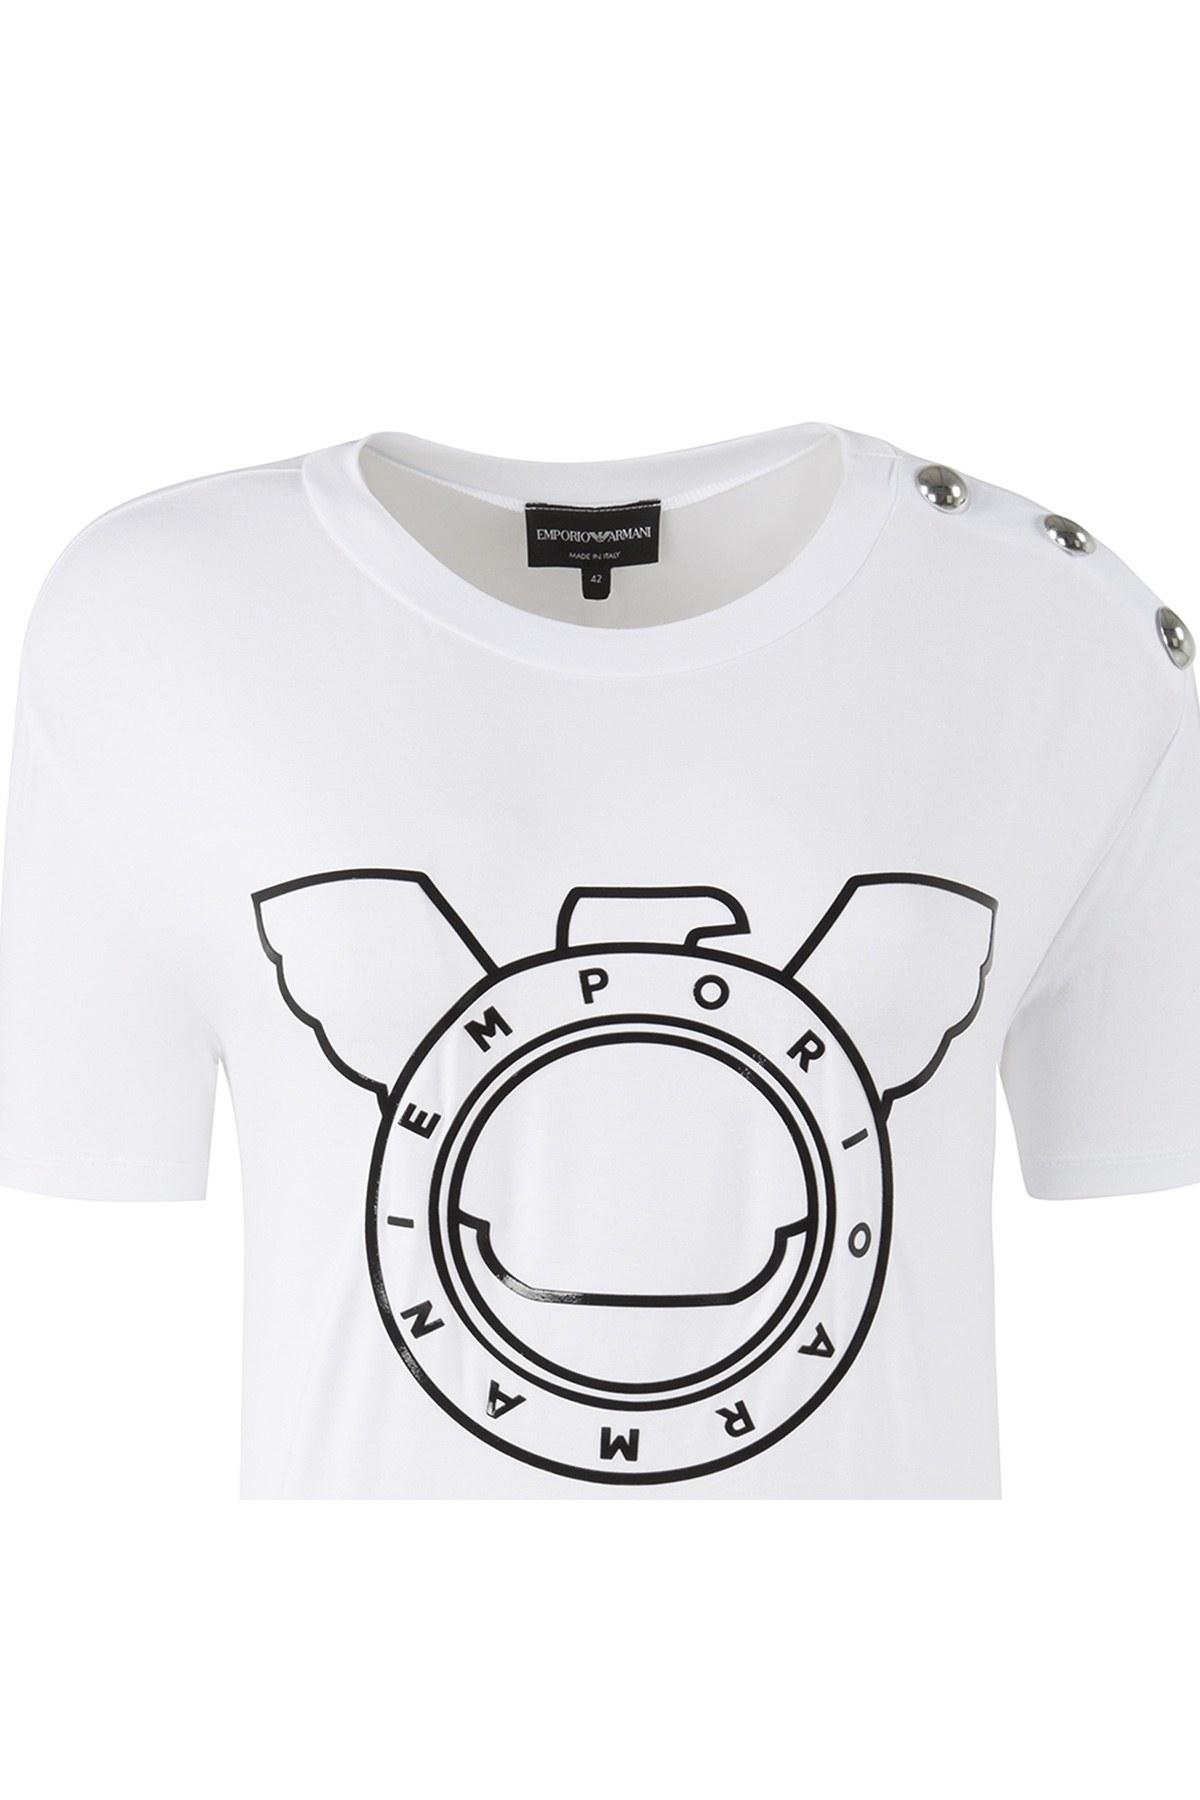 EMPORIO ARMANI T SHIRT Bayan T Shirt 6Z2T7S 2J9ZZ 0100 BEYAZ